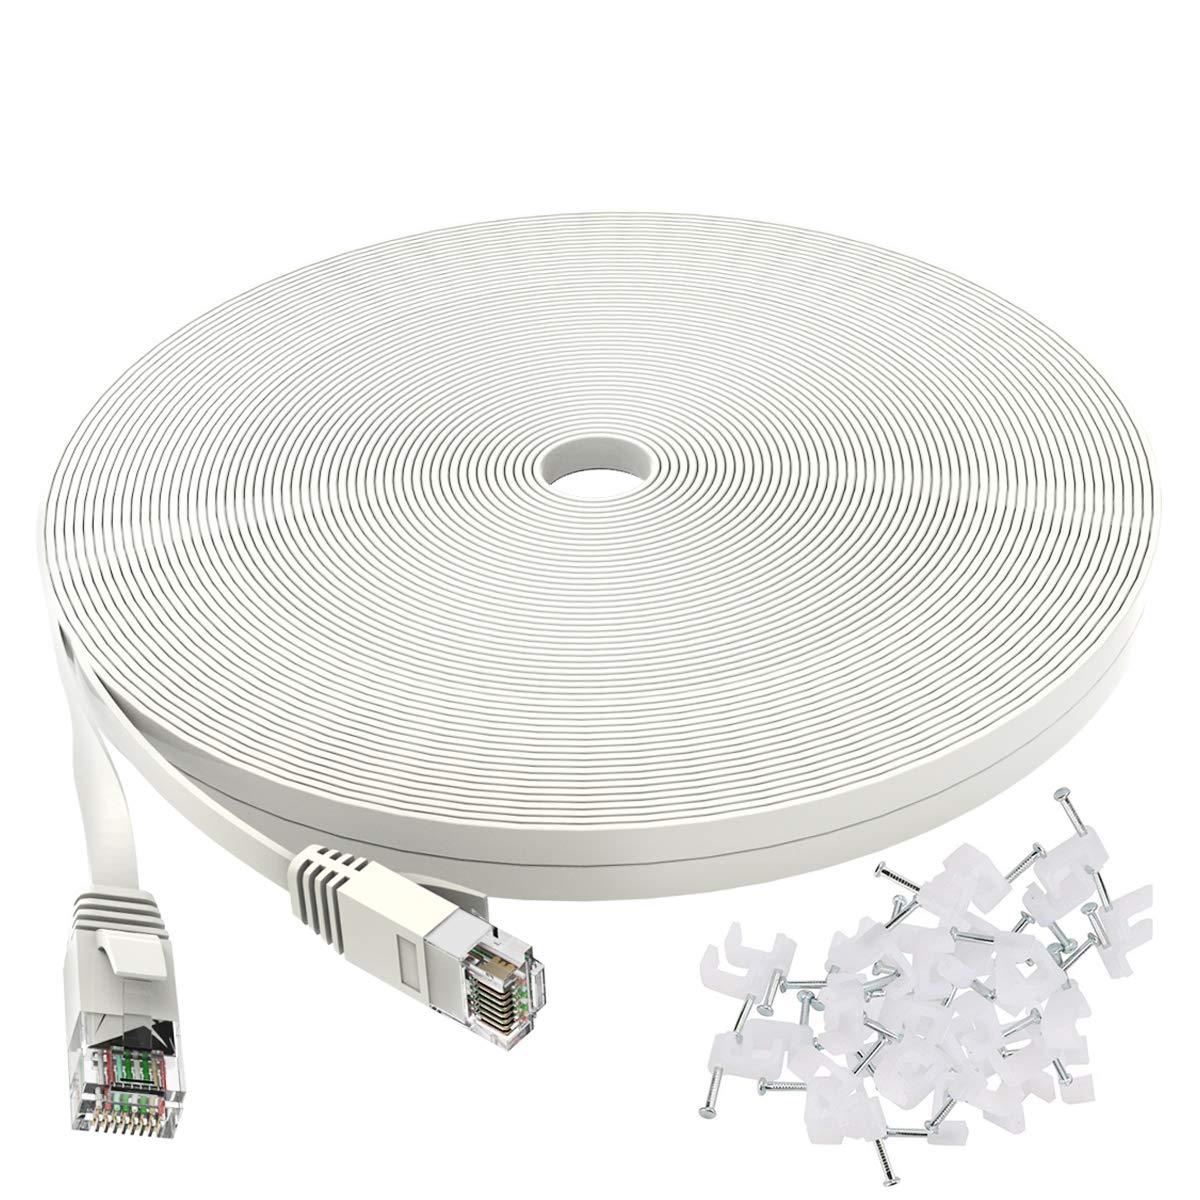 Cat 6 Ethernet Cable 50 ft 5 popular White Finally popular brand Internet Flat - pat Network Lan